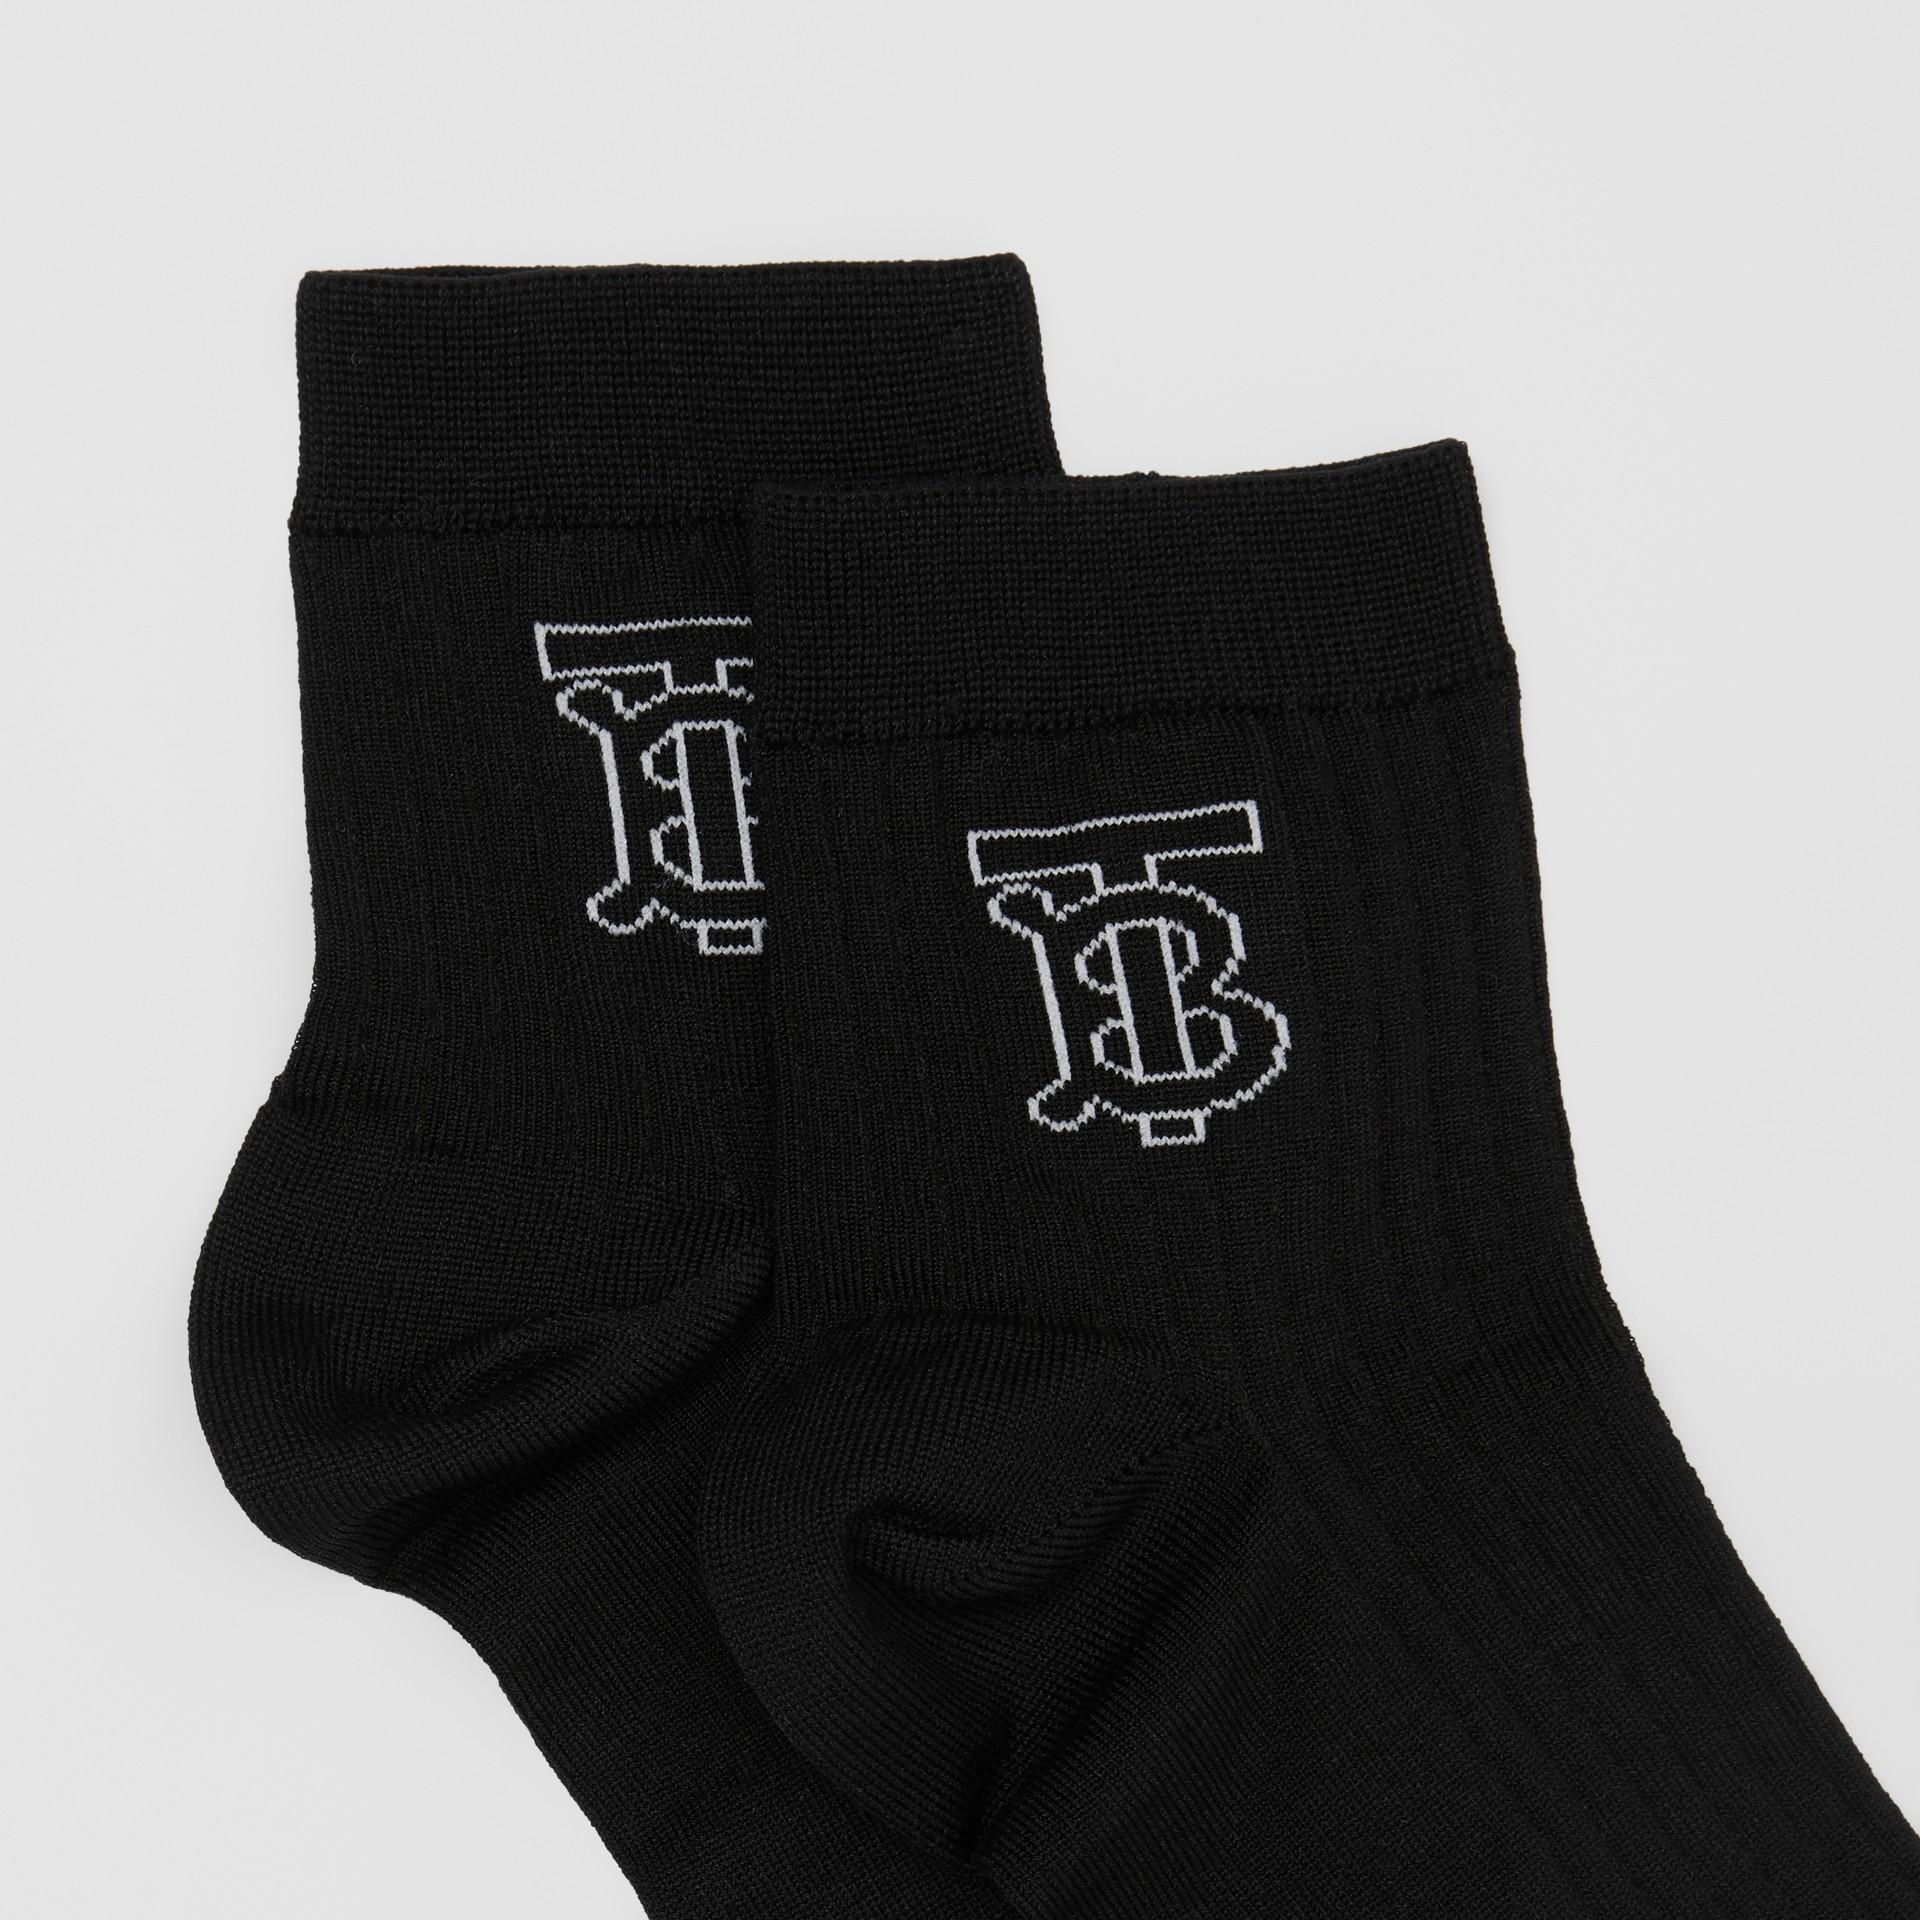 Monogram Intarsia Cotton Blend Socks in Black/white   Burberry United States - gallery image 1